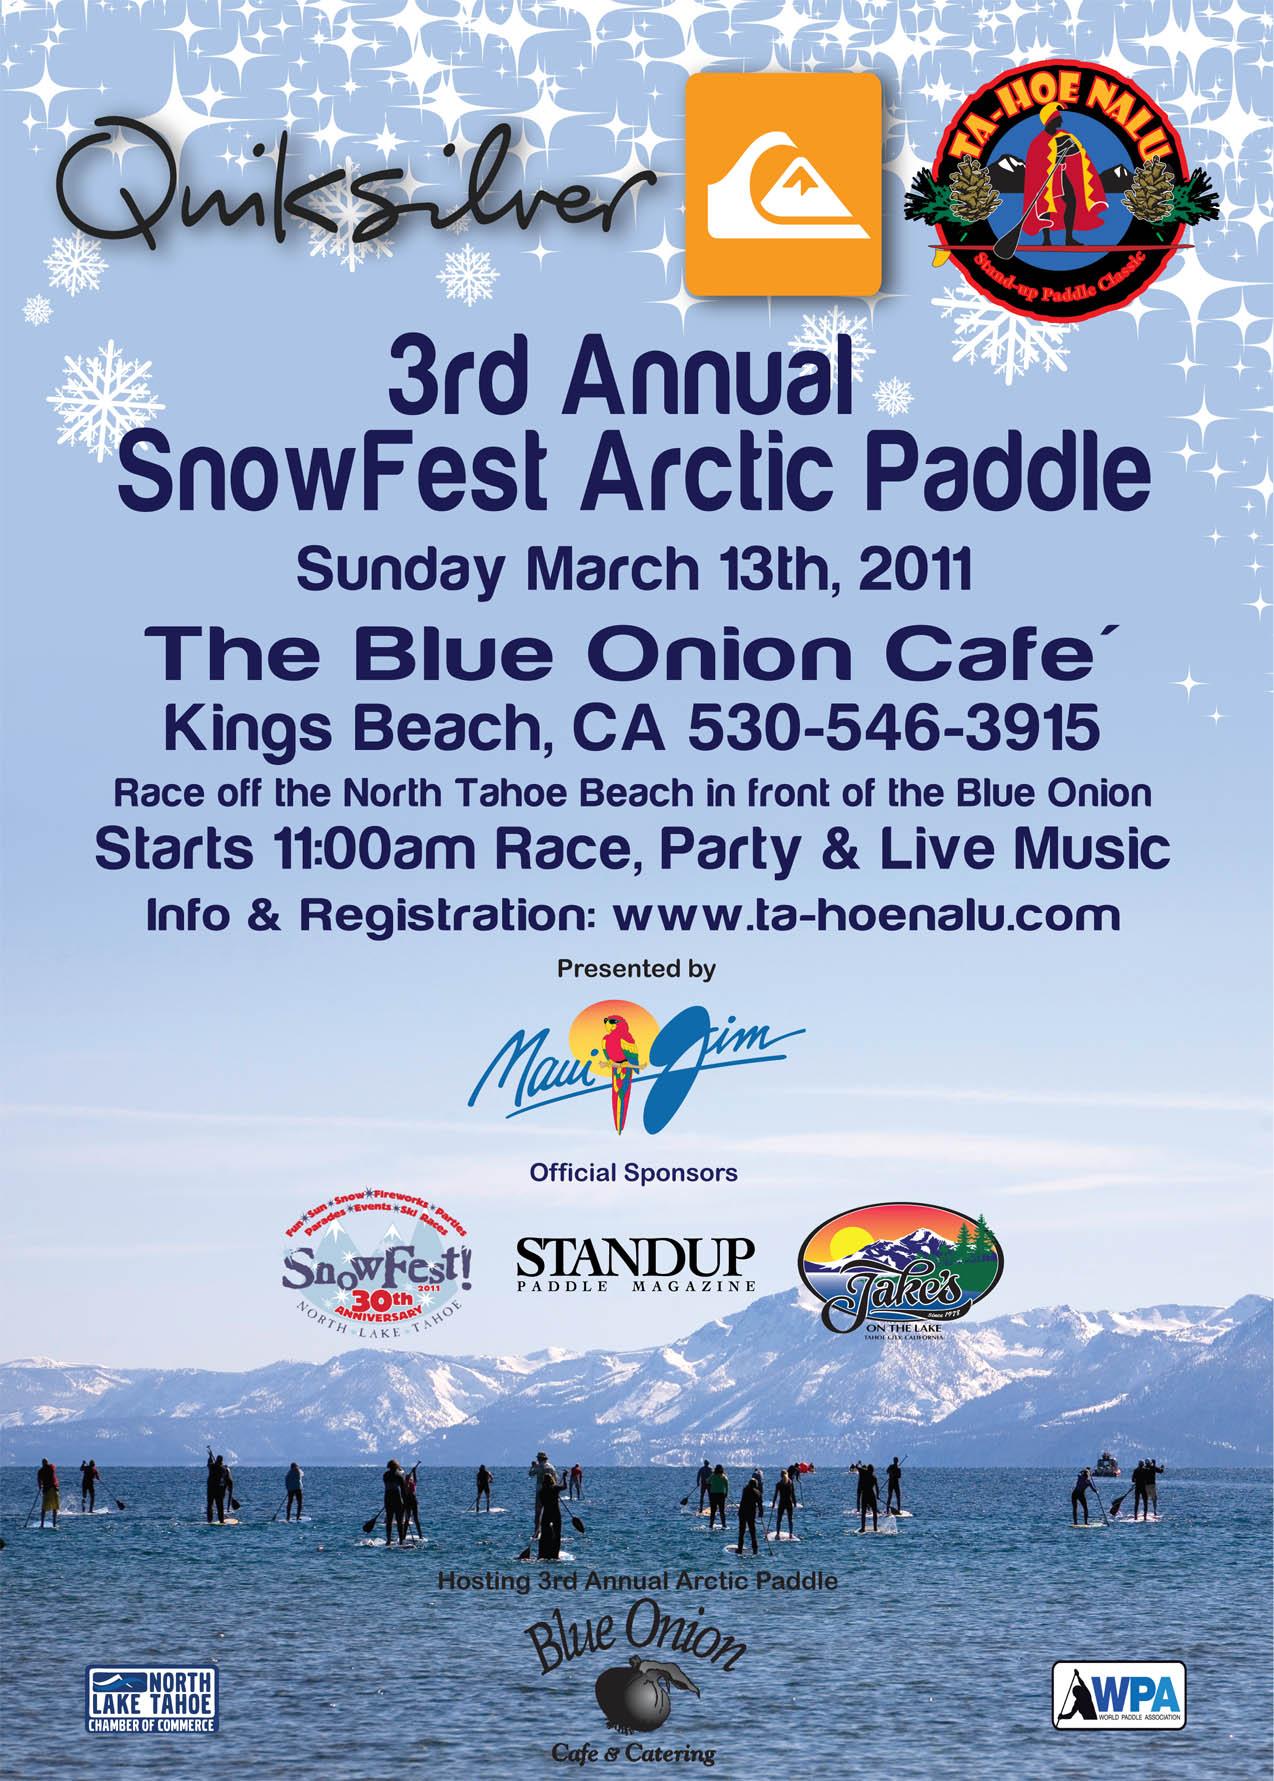 2011 SnowFest Arctic Paddle